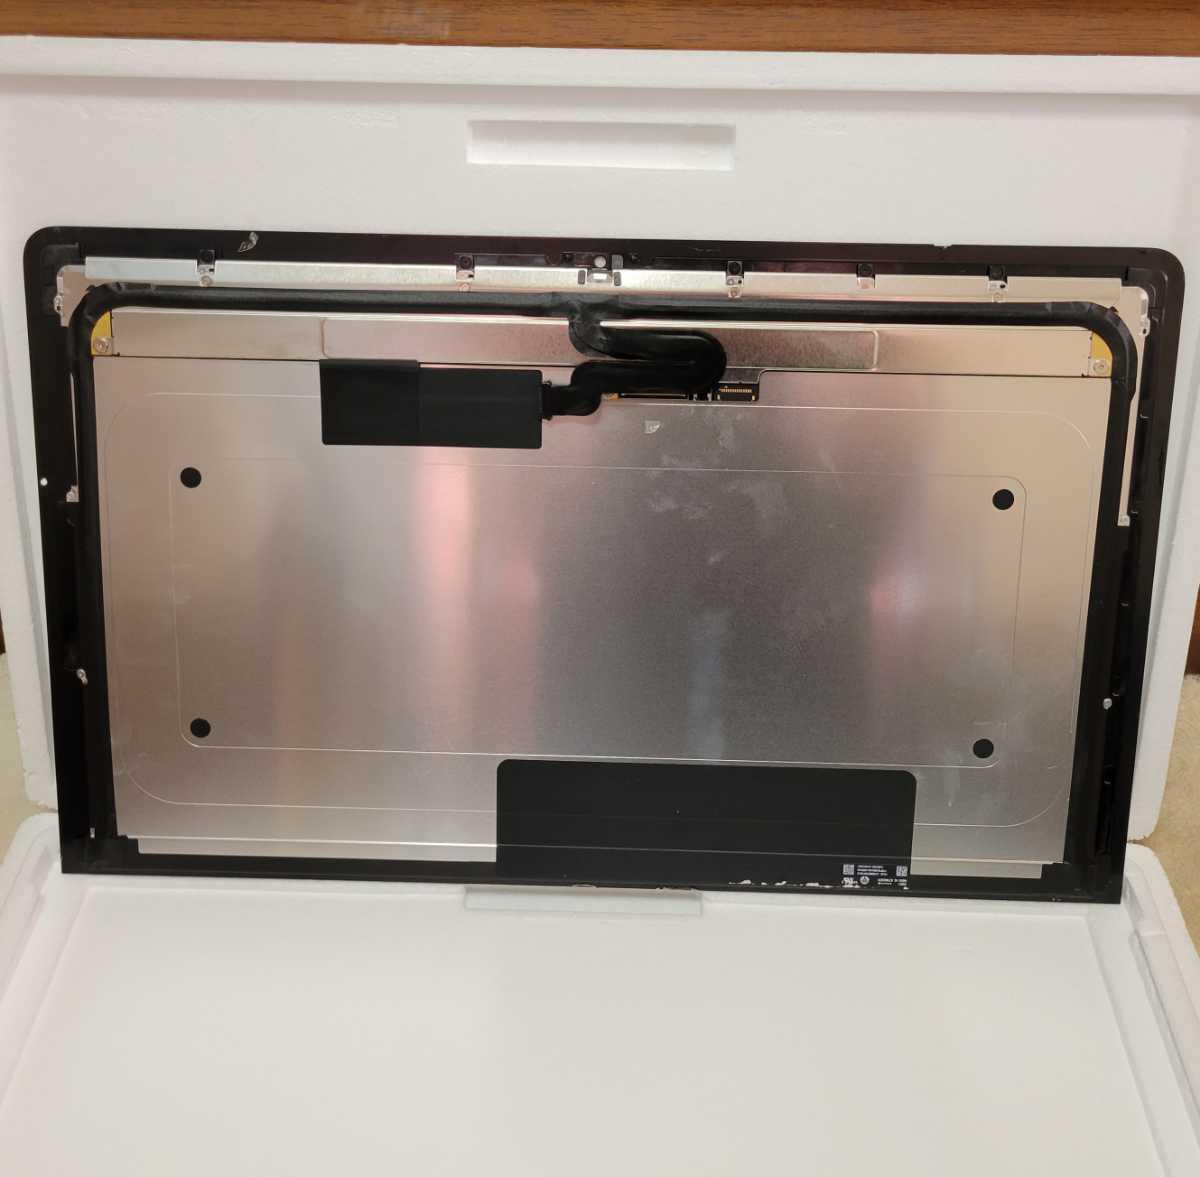 iMac 21.5-inch 4K ディスプレイ 割れ ジャンク_画像2